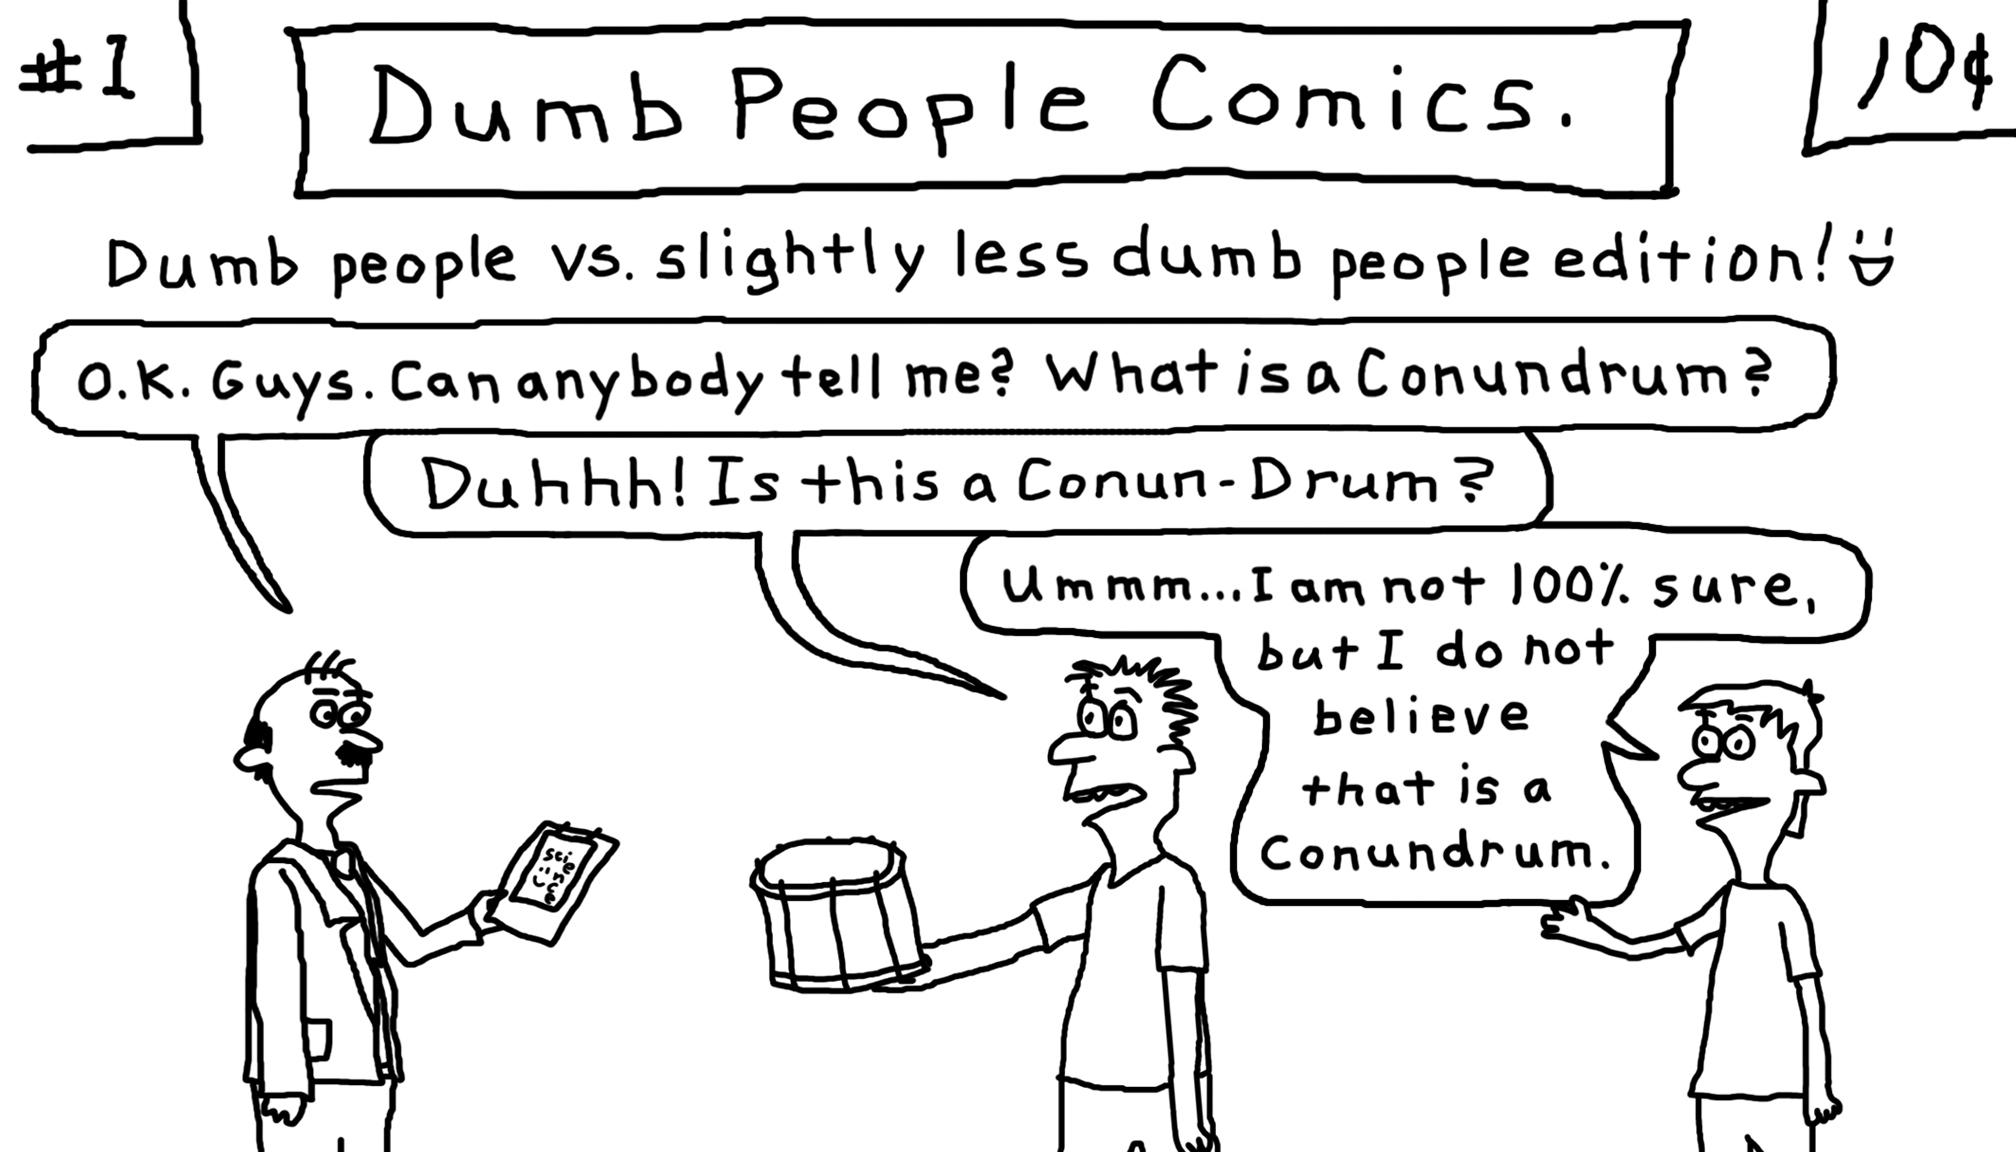 Dumb and dumber.